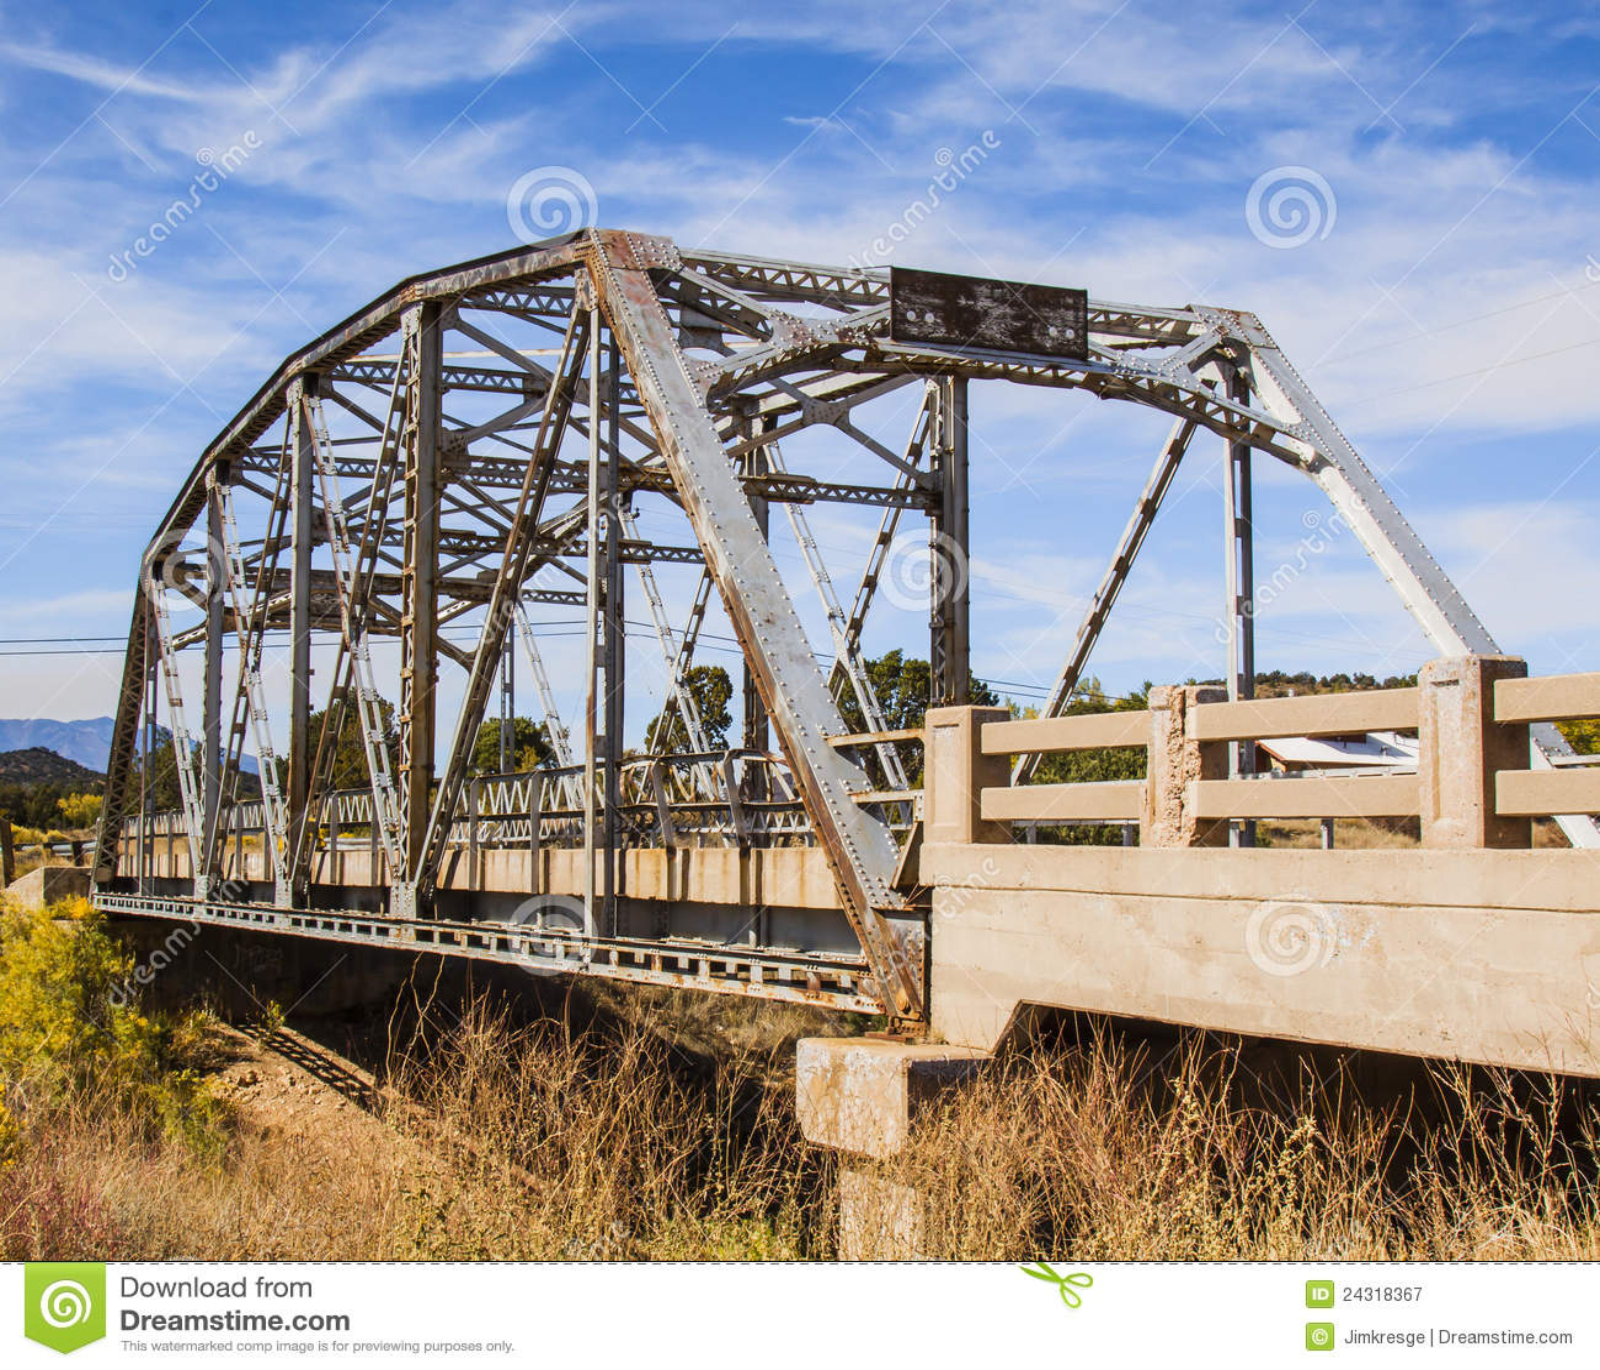 Winona (MS) United States  city photos : Abandoned Bridge Rt 66 Winona, AZ Royalty Free Stock Photography ...